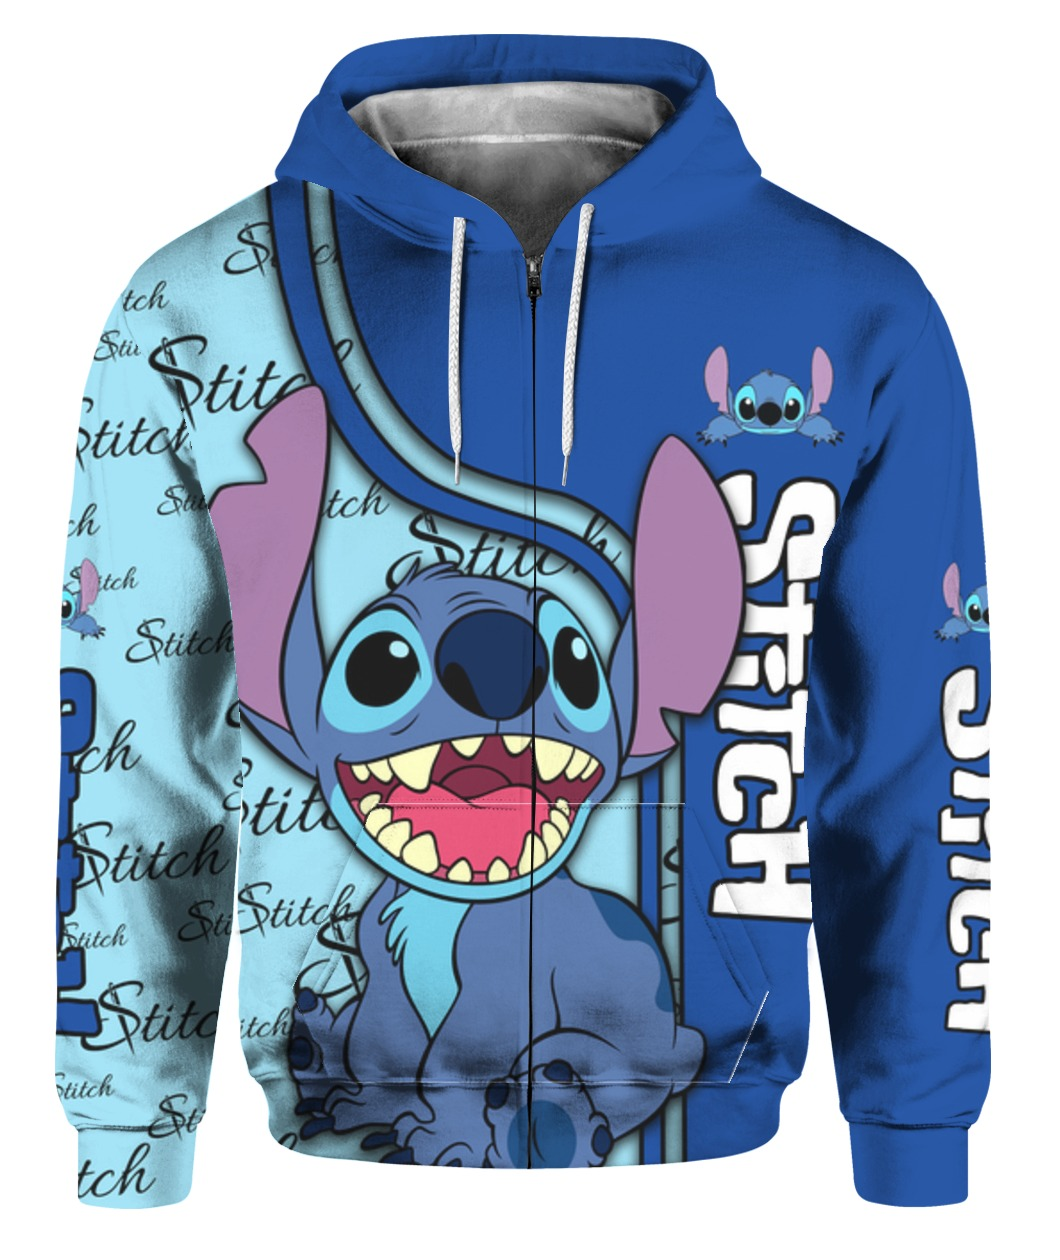 Stitch full printing zip hoodie 1